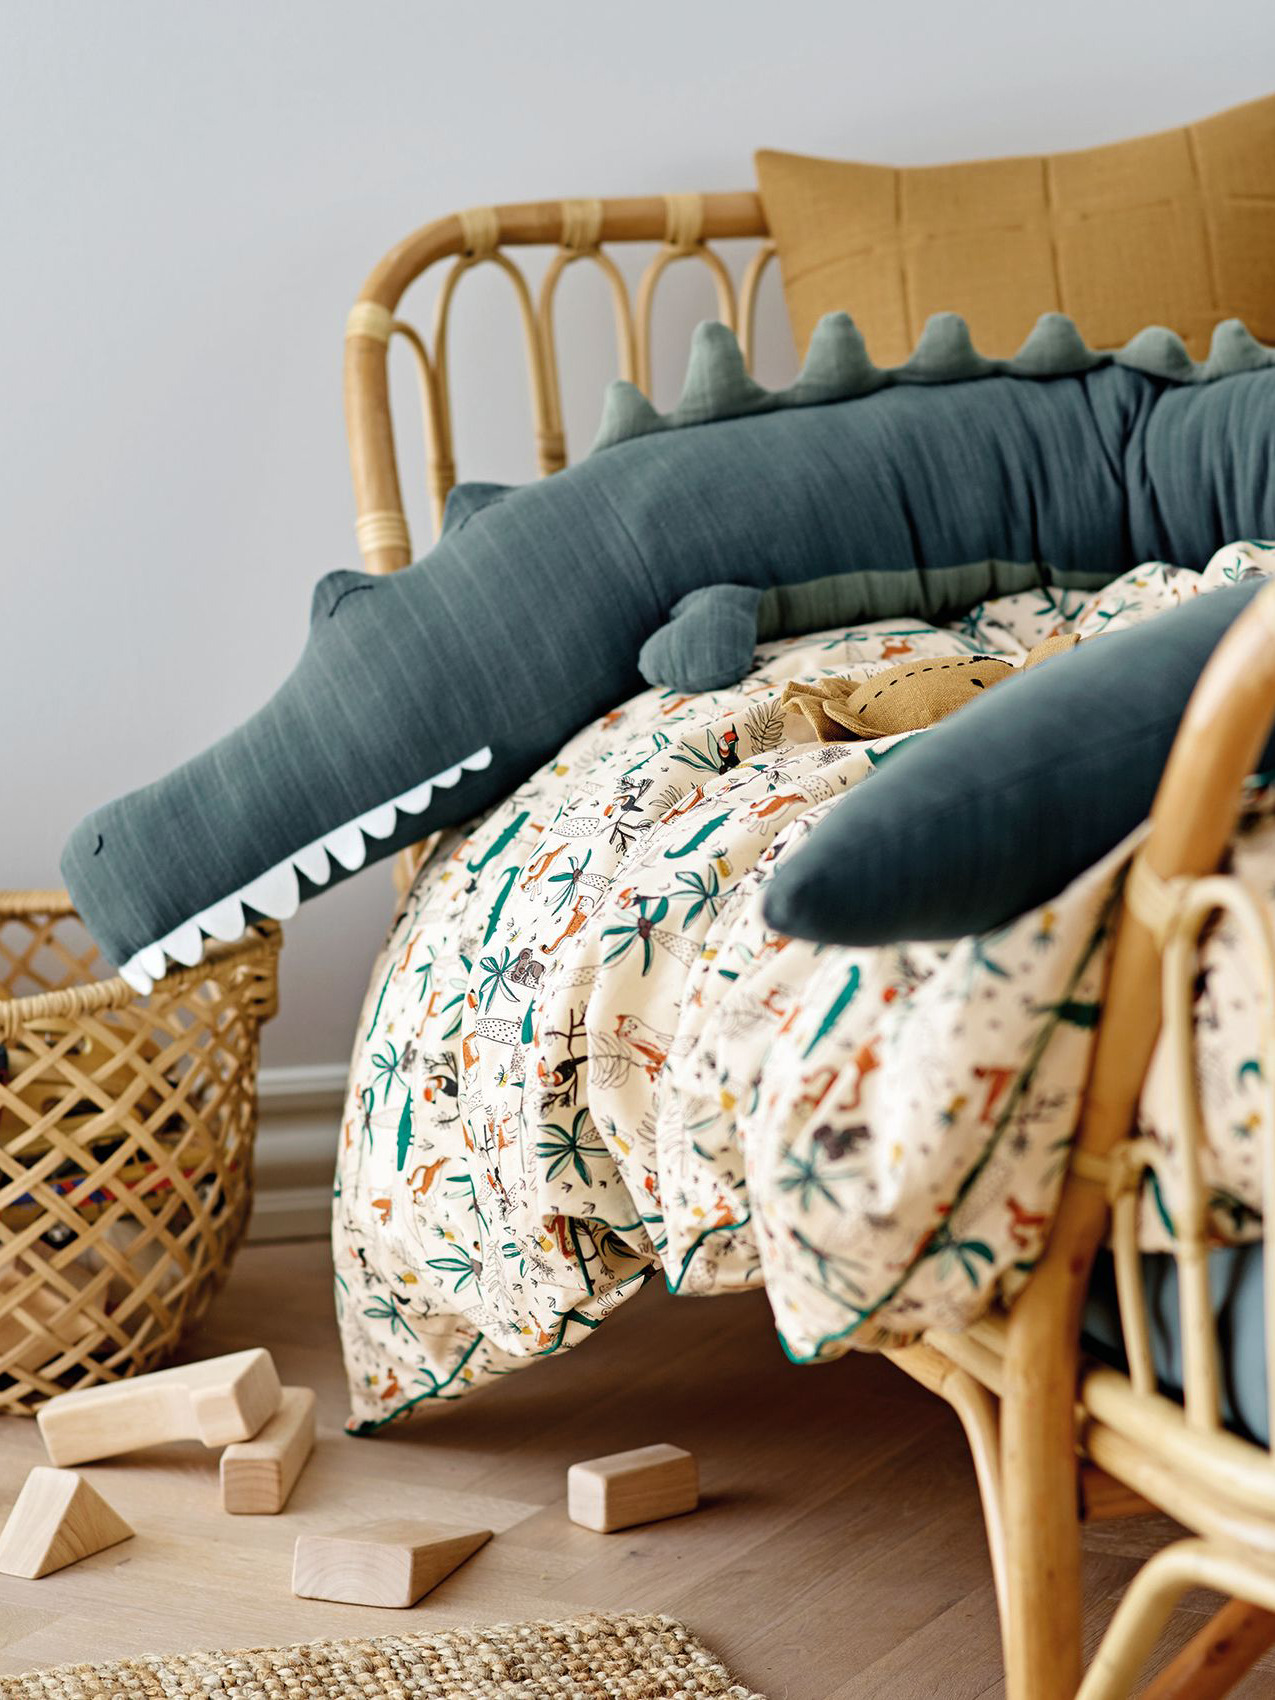 《Stoff & Stil》2020春夏儿童&婴幼童床上用品系列Lookbook